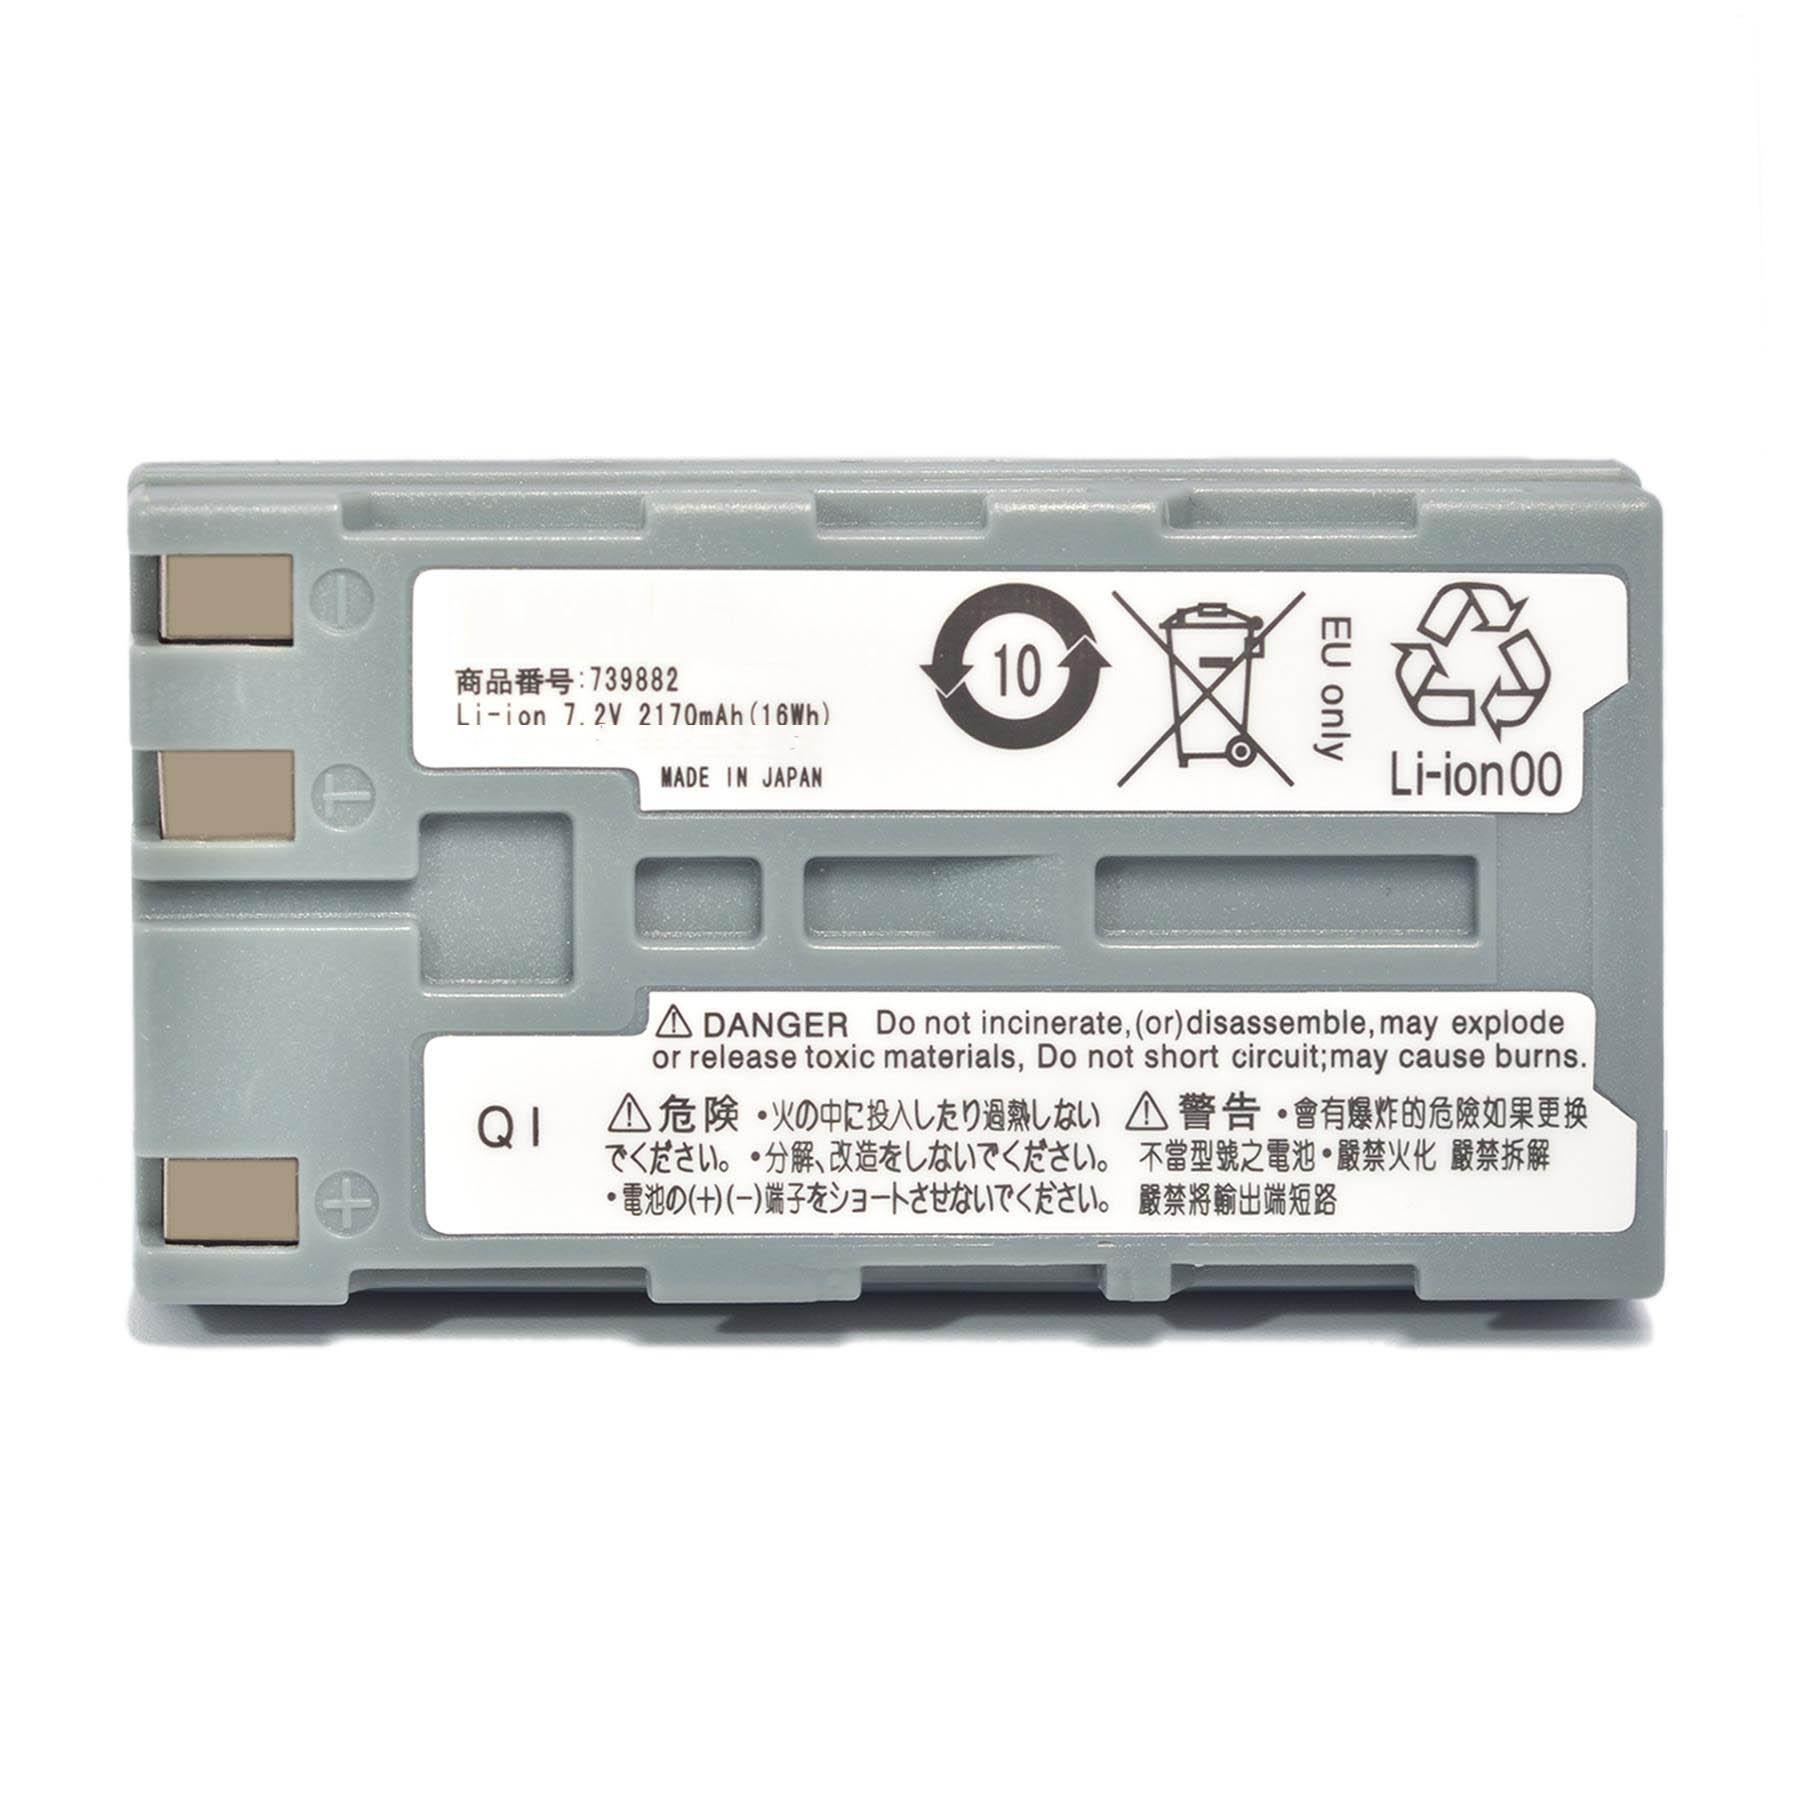 Mejor 2600mAH nueva OTDR batería para Yokogawa AQ1200 AQ1200B AQ1200C AQ1200E AQ1205A AQ1205E AQ1205F IM-AQ1200-02EN 739882